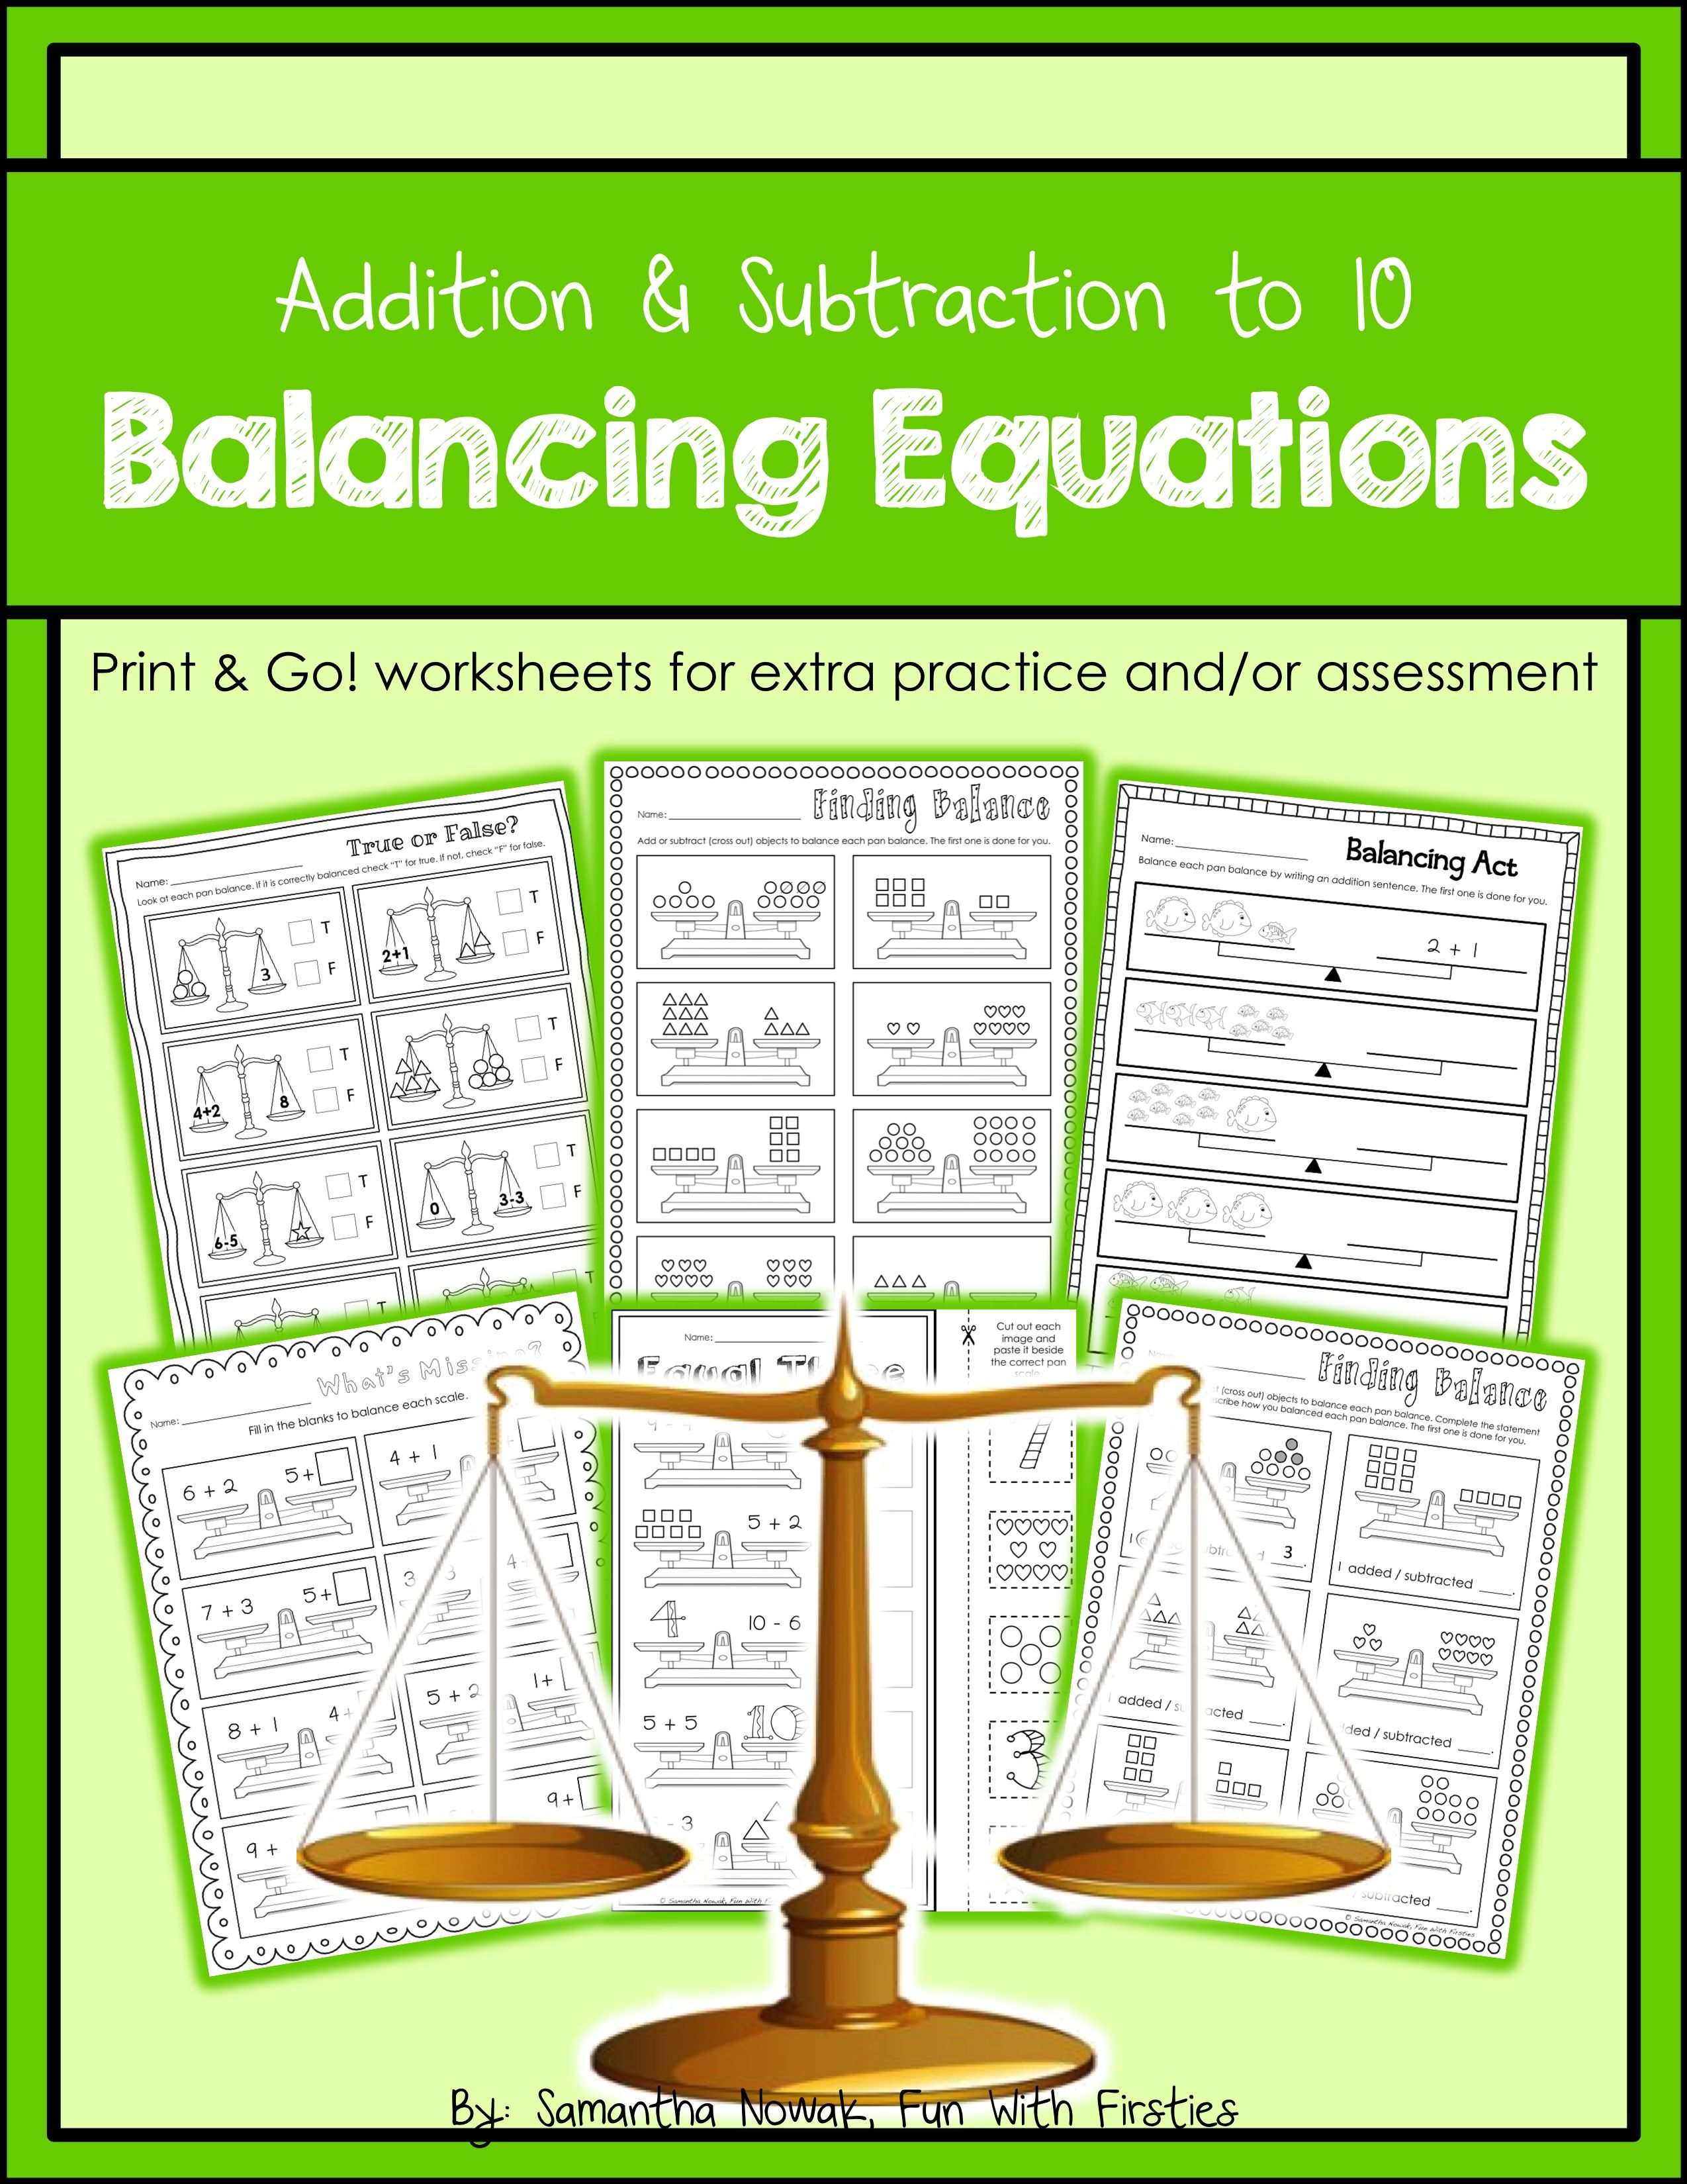 Balancing Equations Balancing Equations Equations Math Resources [ 3299 x 2549 Pixel ]